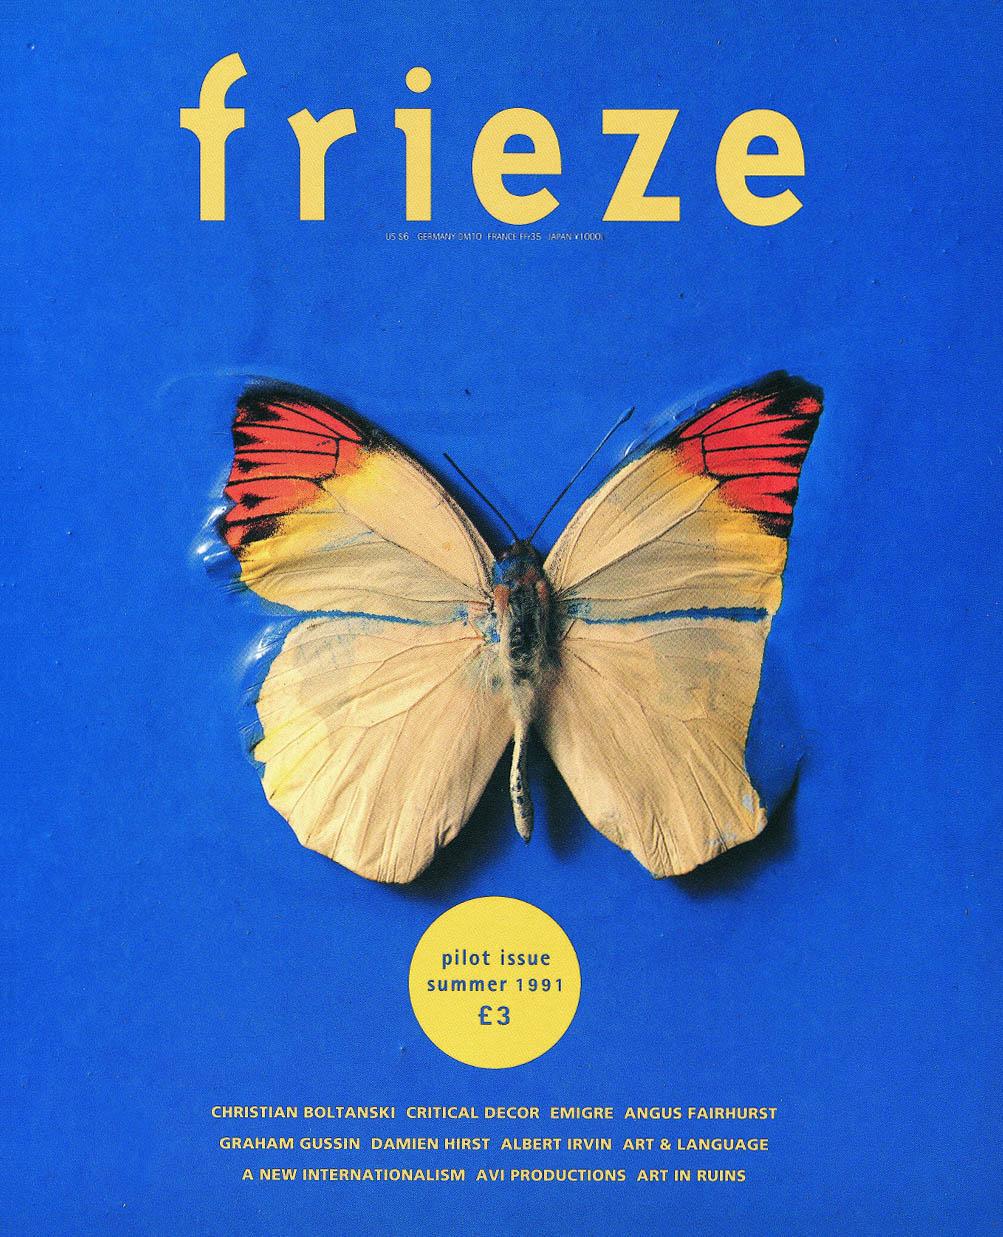 Frieze Pilot Issue Summer 1991 Cover